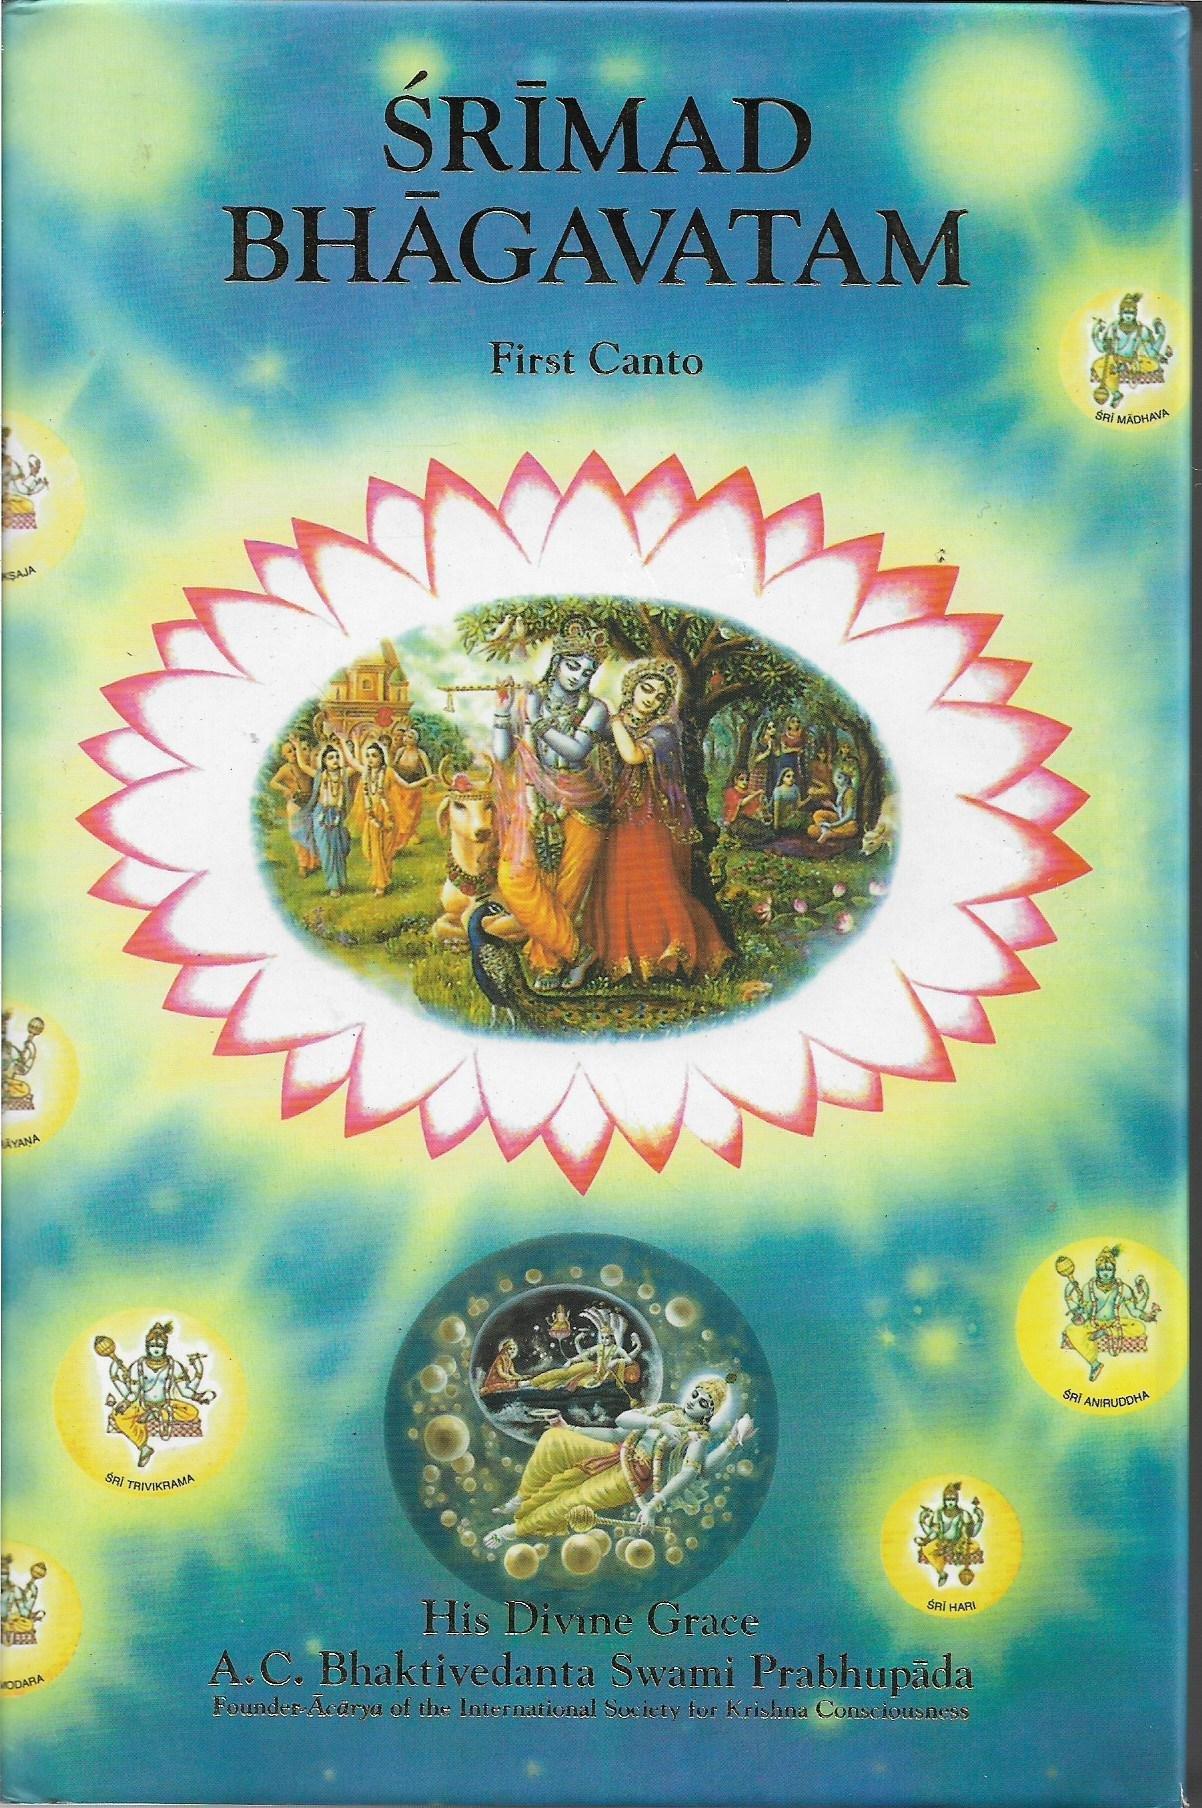 Srimad Bhagavtam image